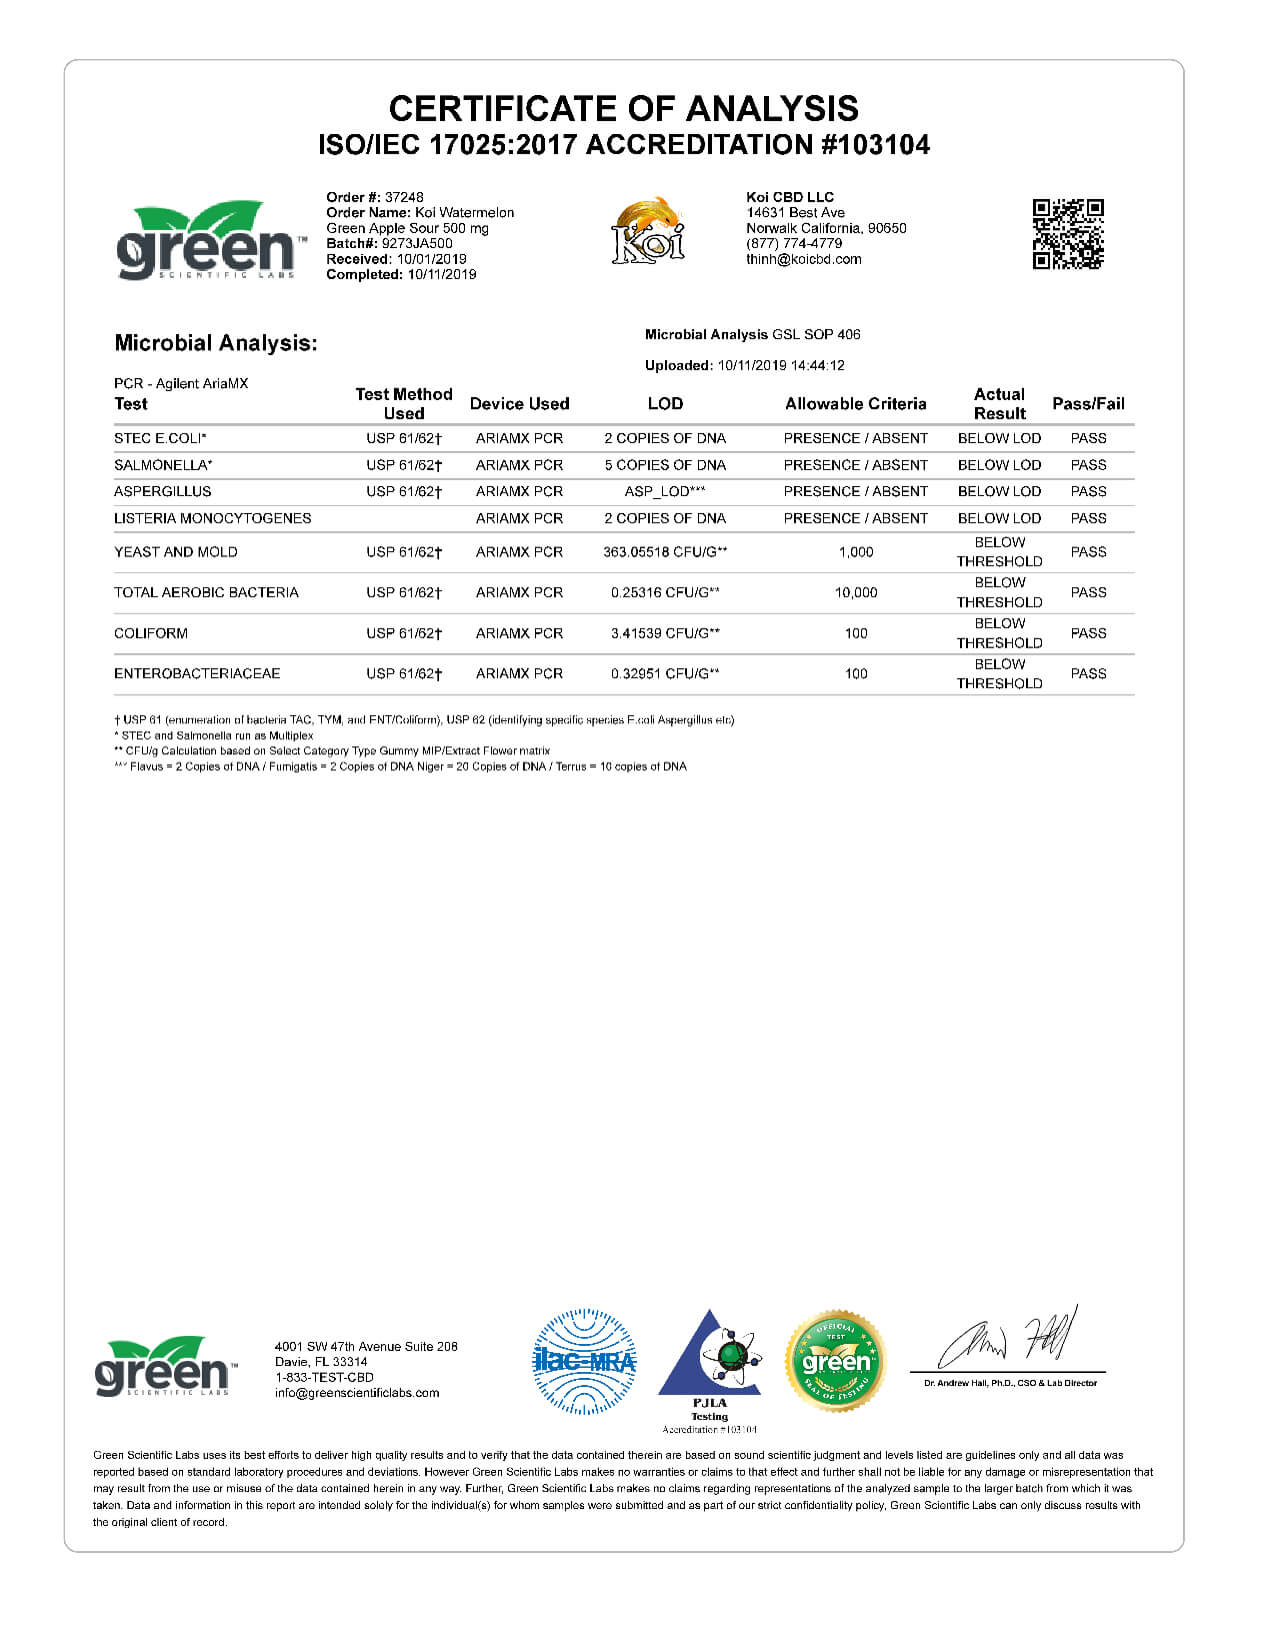 Koi CBD Watermelon Green Apple Sour Vape Oil 500mg page5